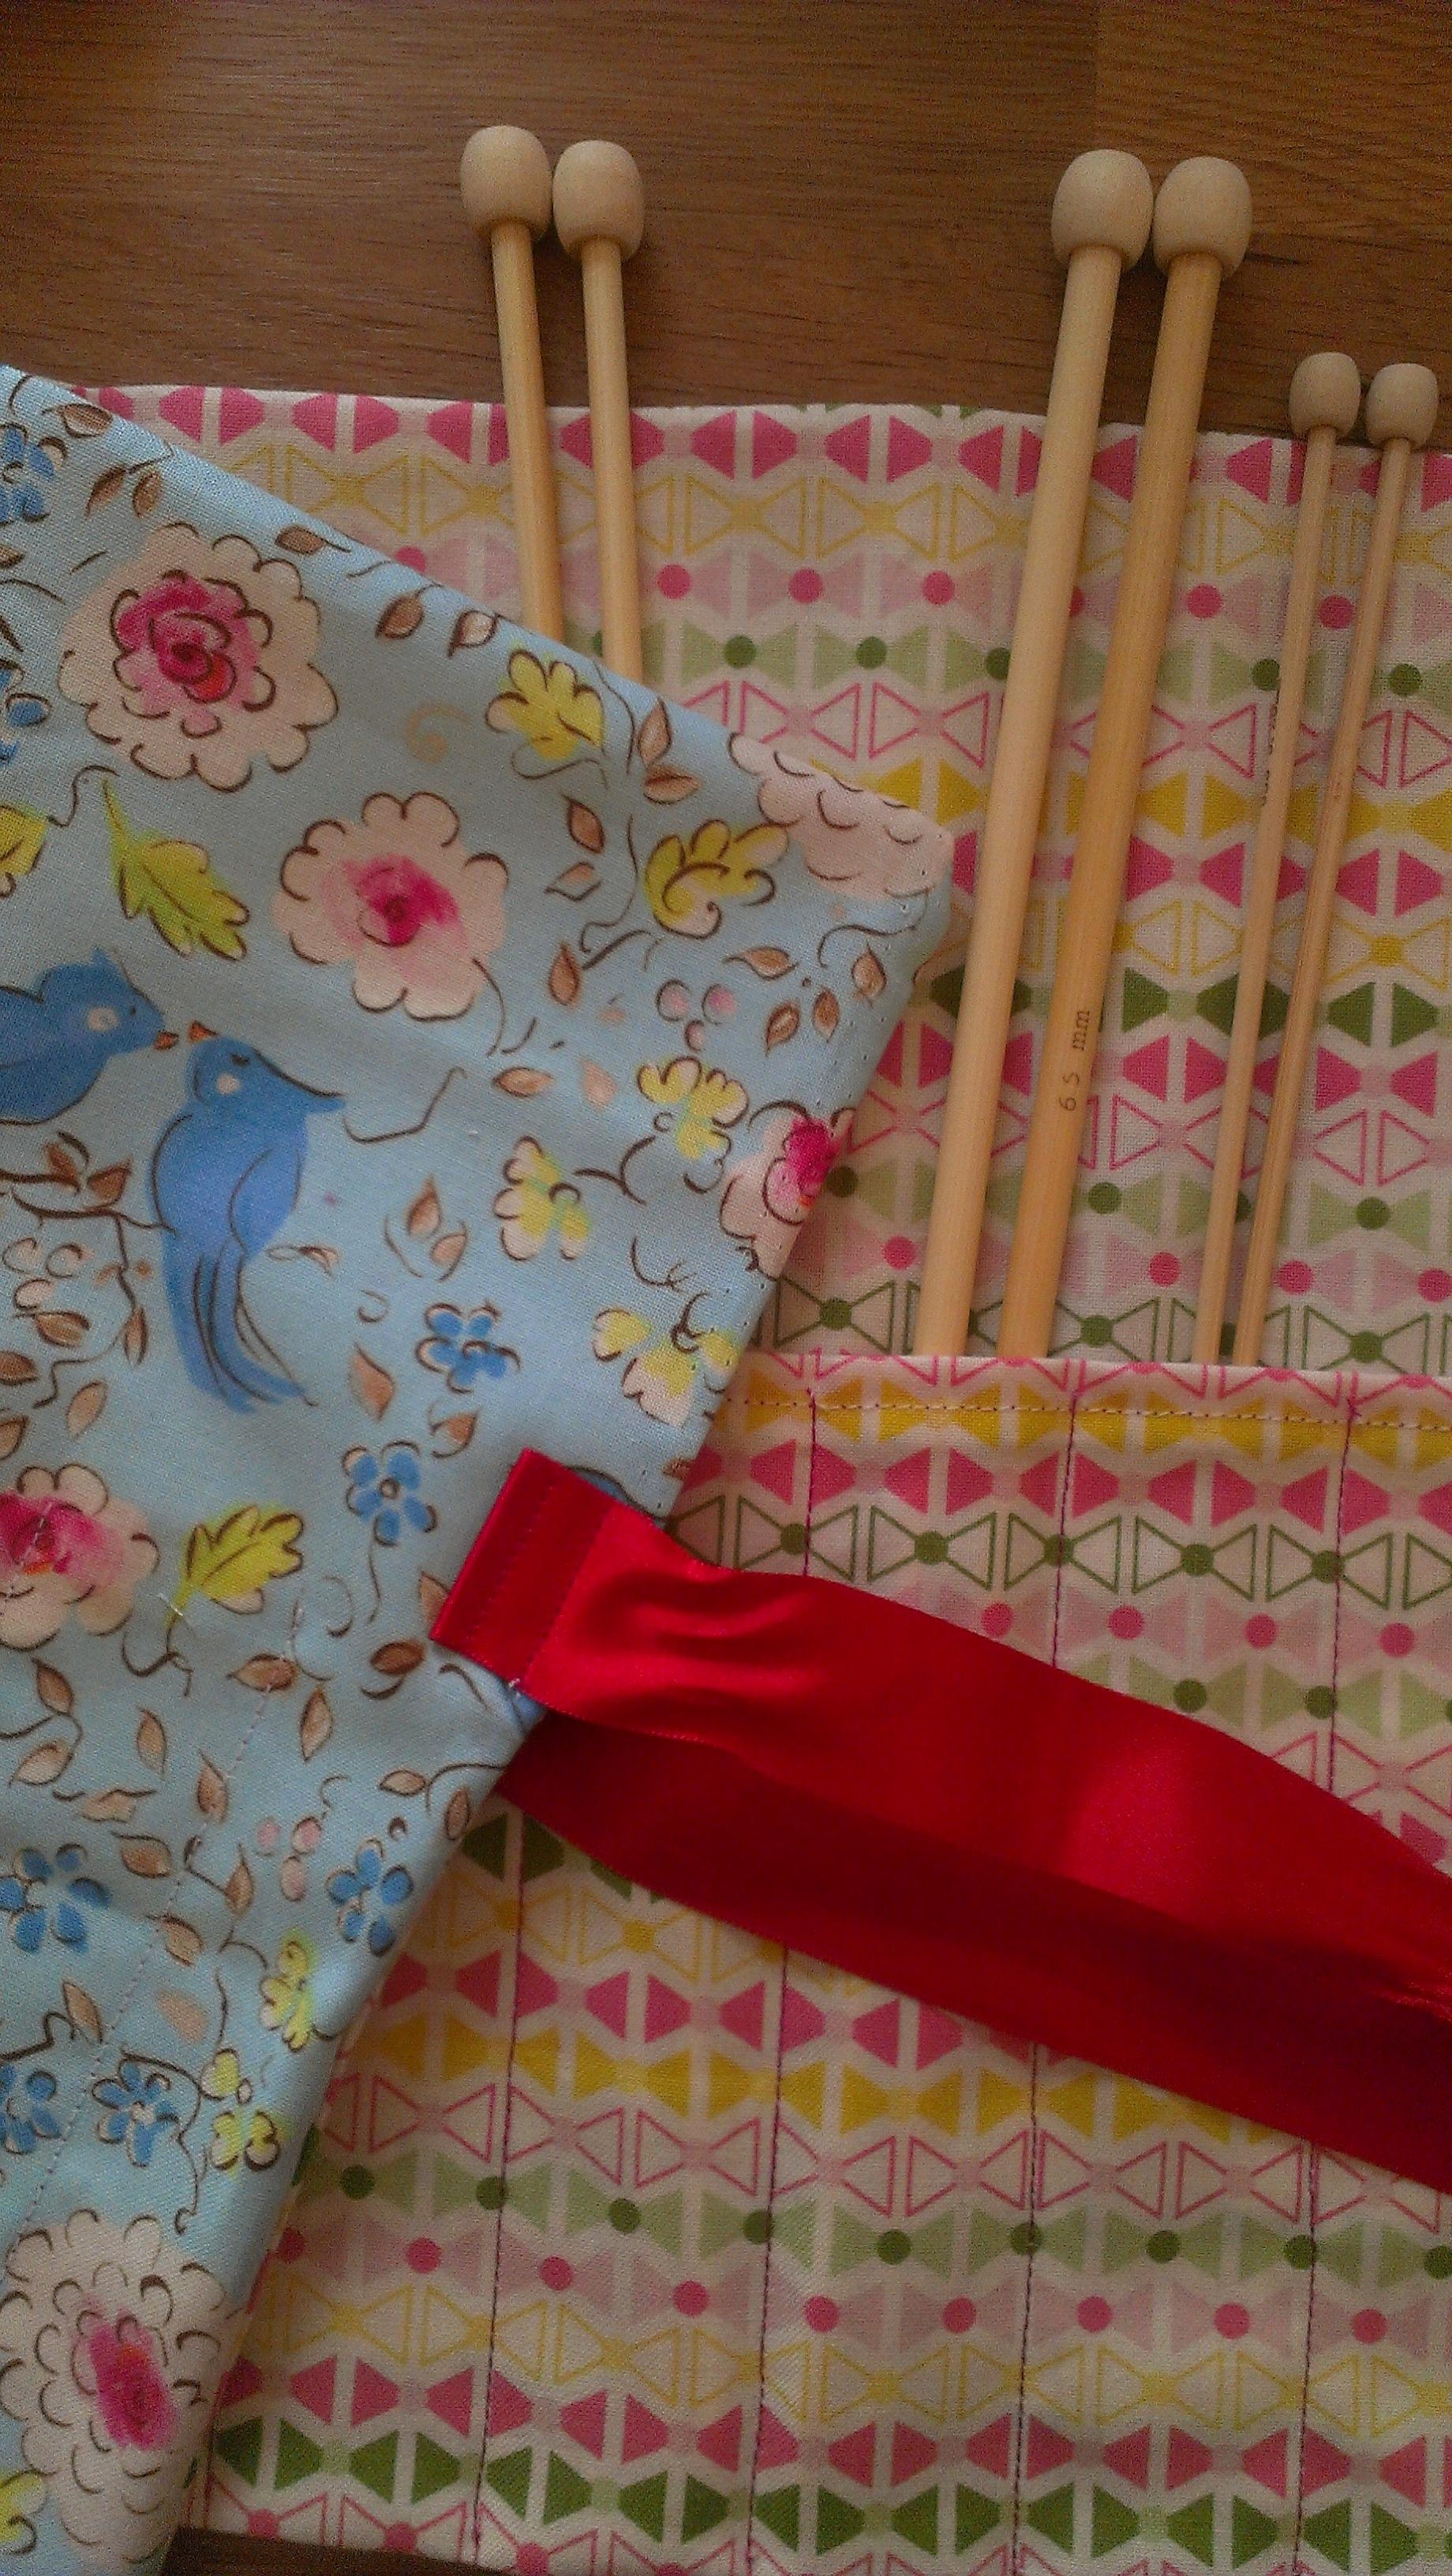 Make a Knitting Needle Roll Sew Sensational